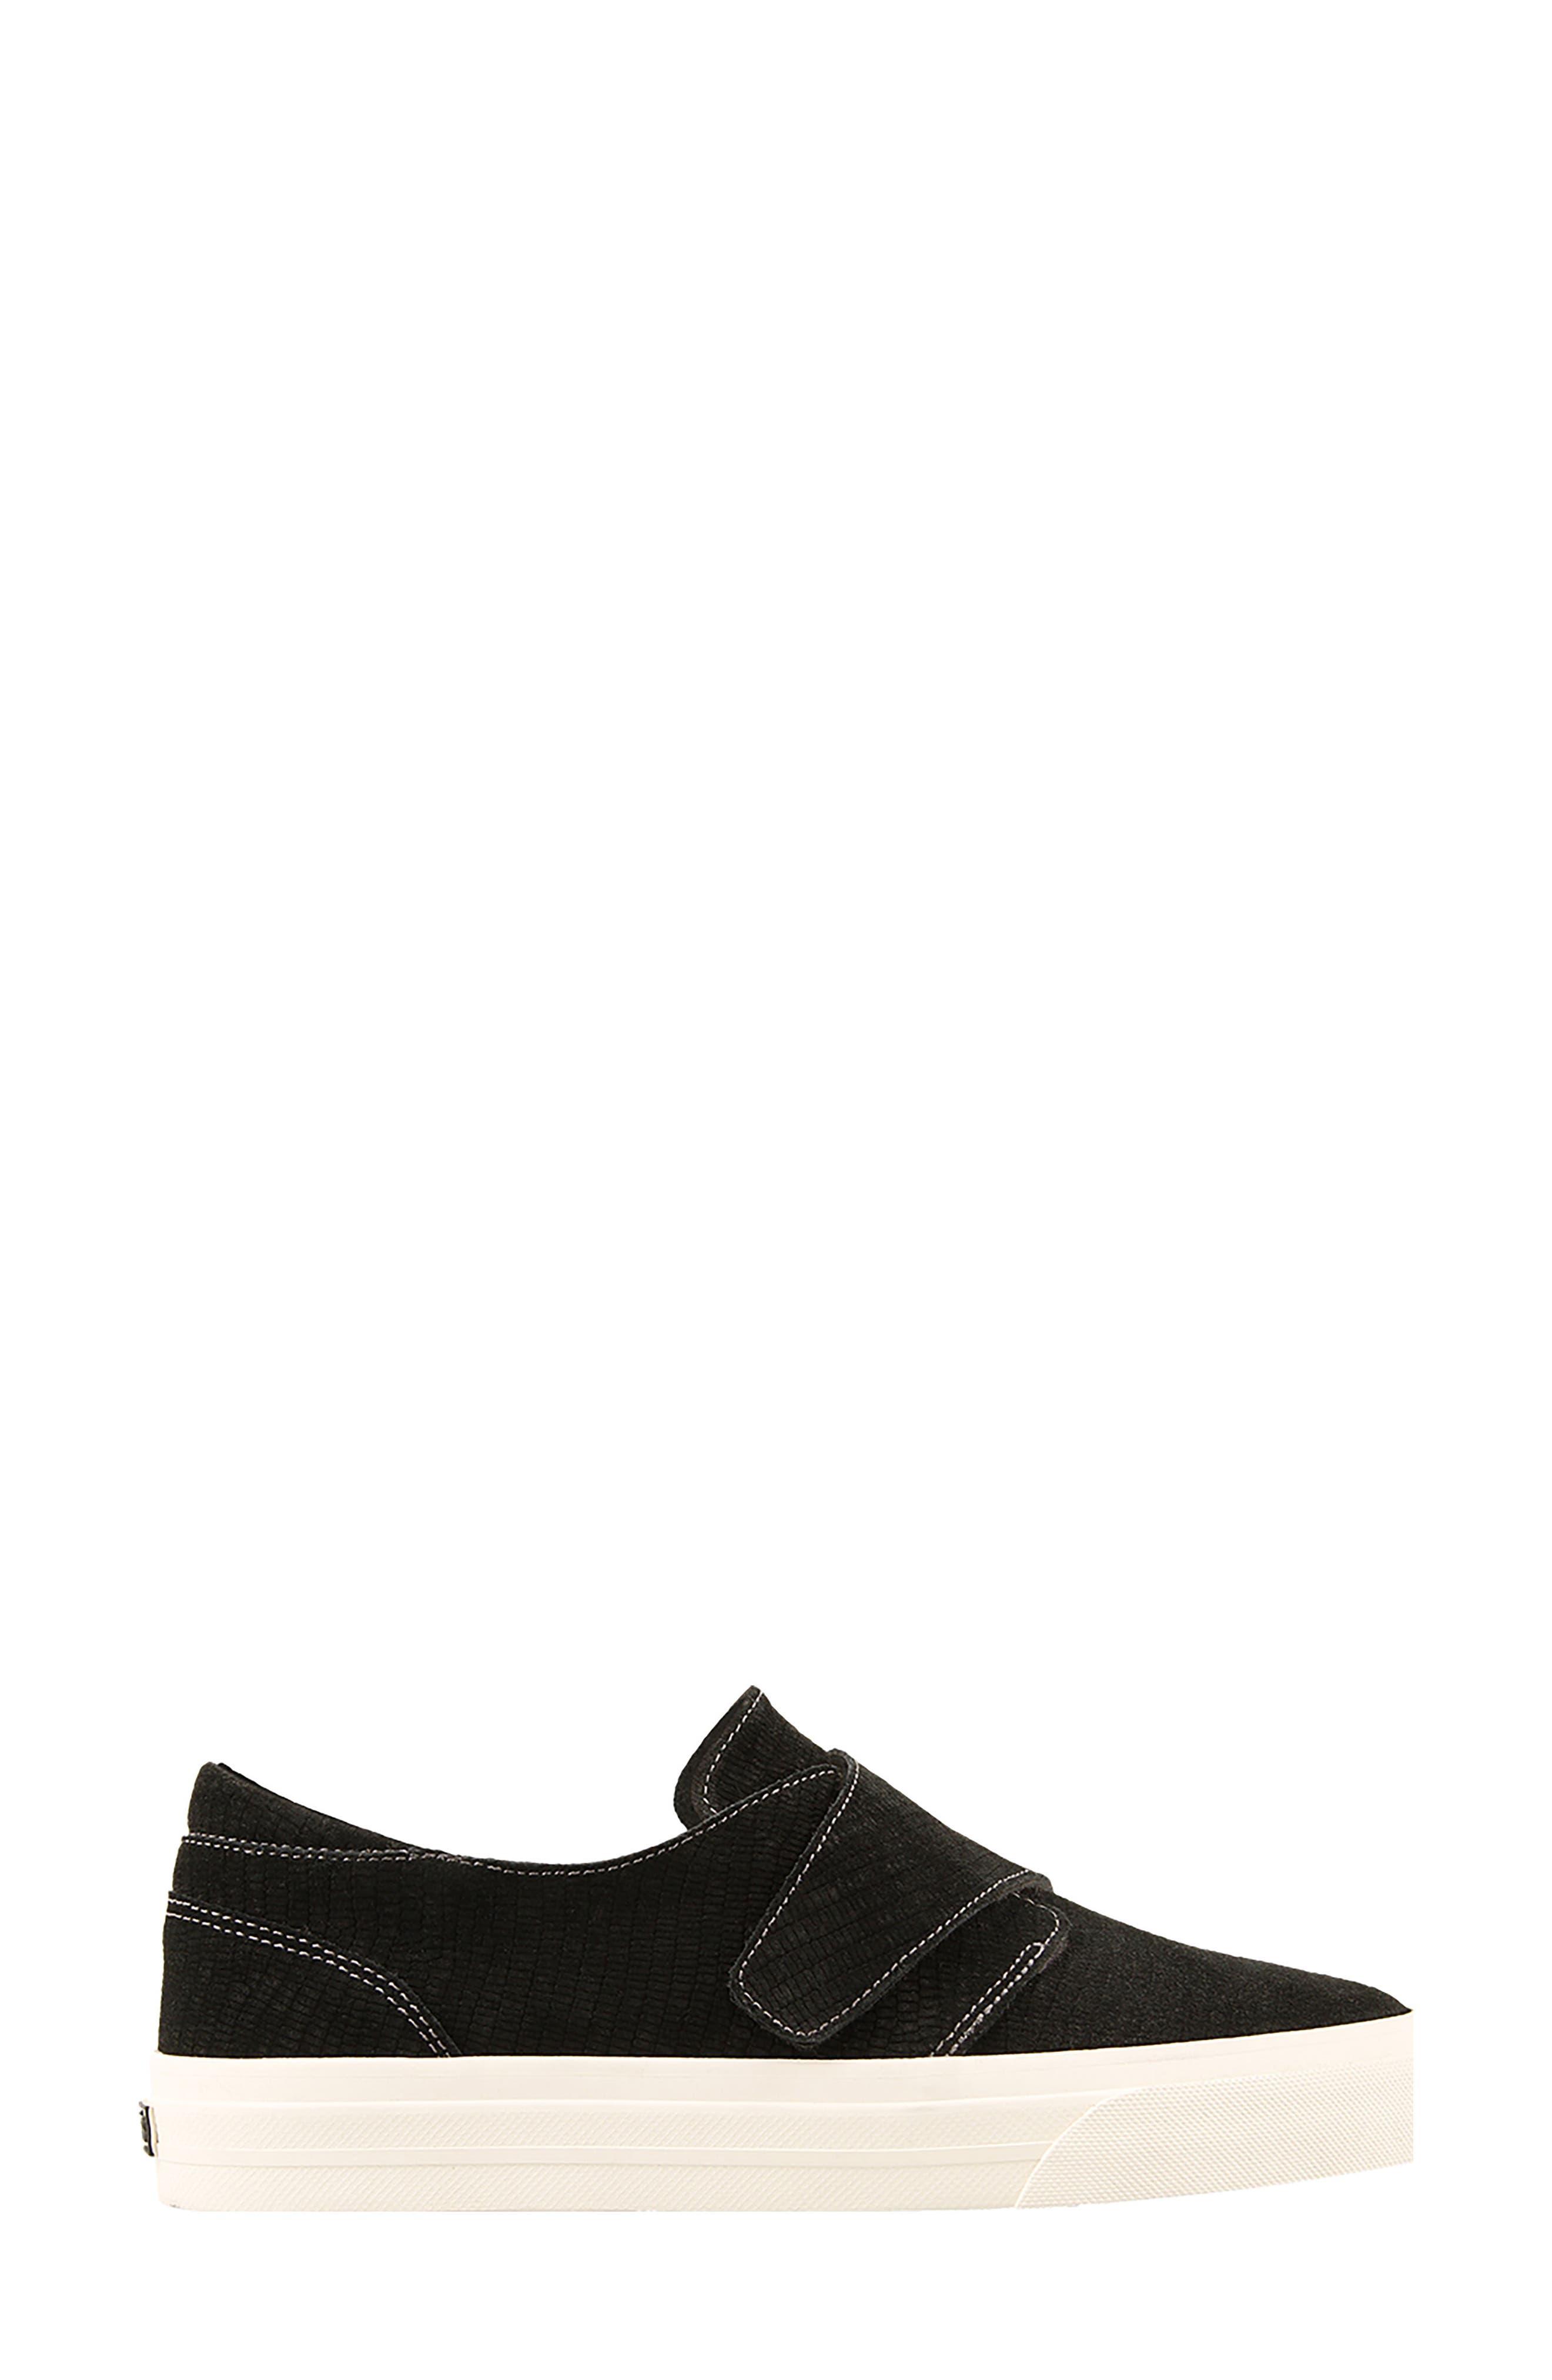 Alternate Image 3  - Taos Soul Sneaker (Women)